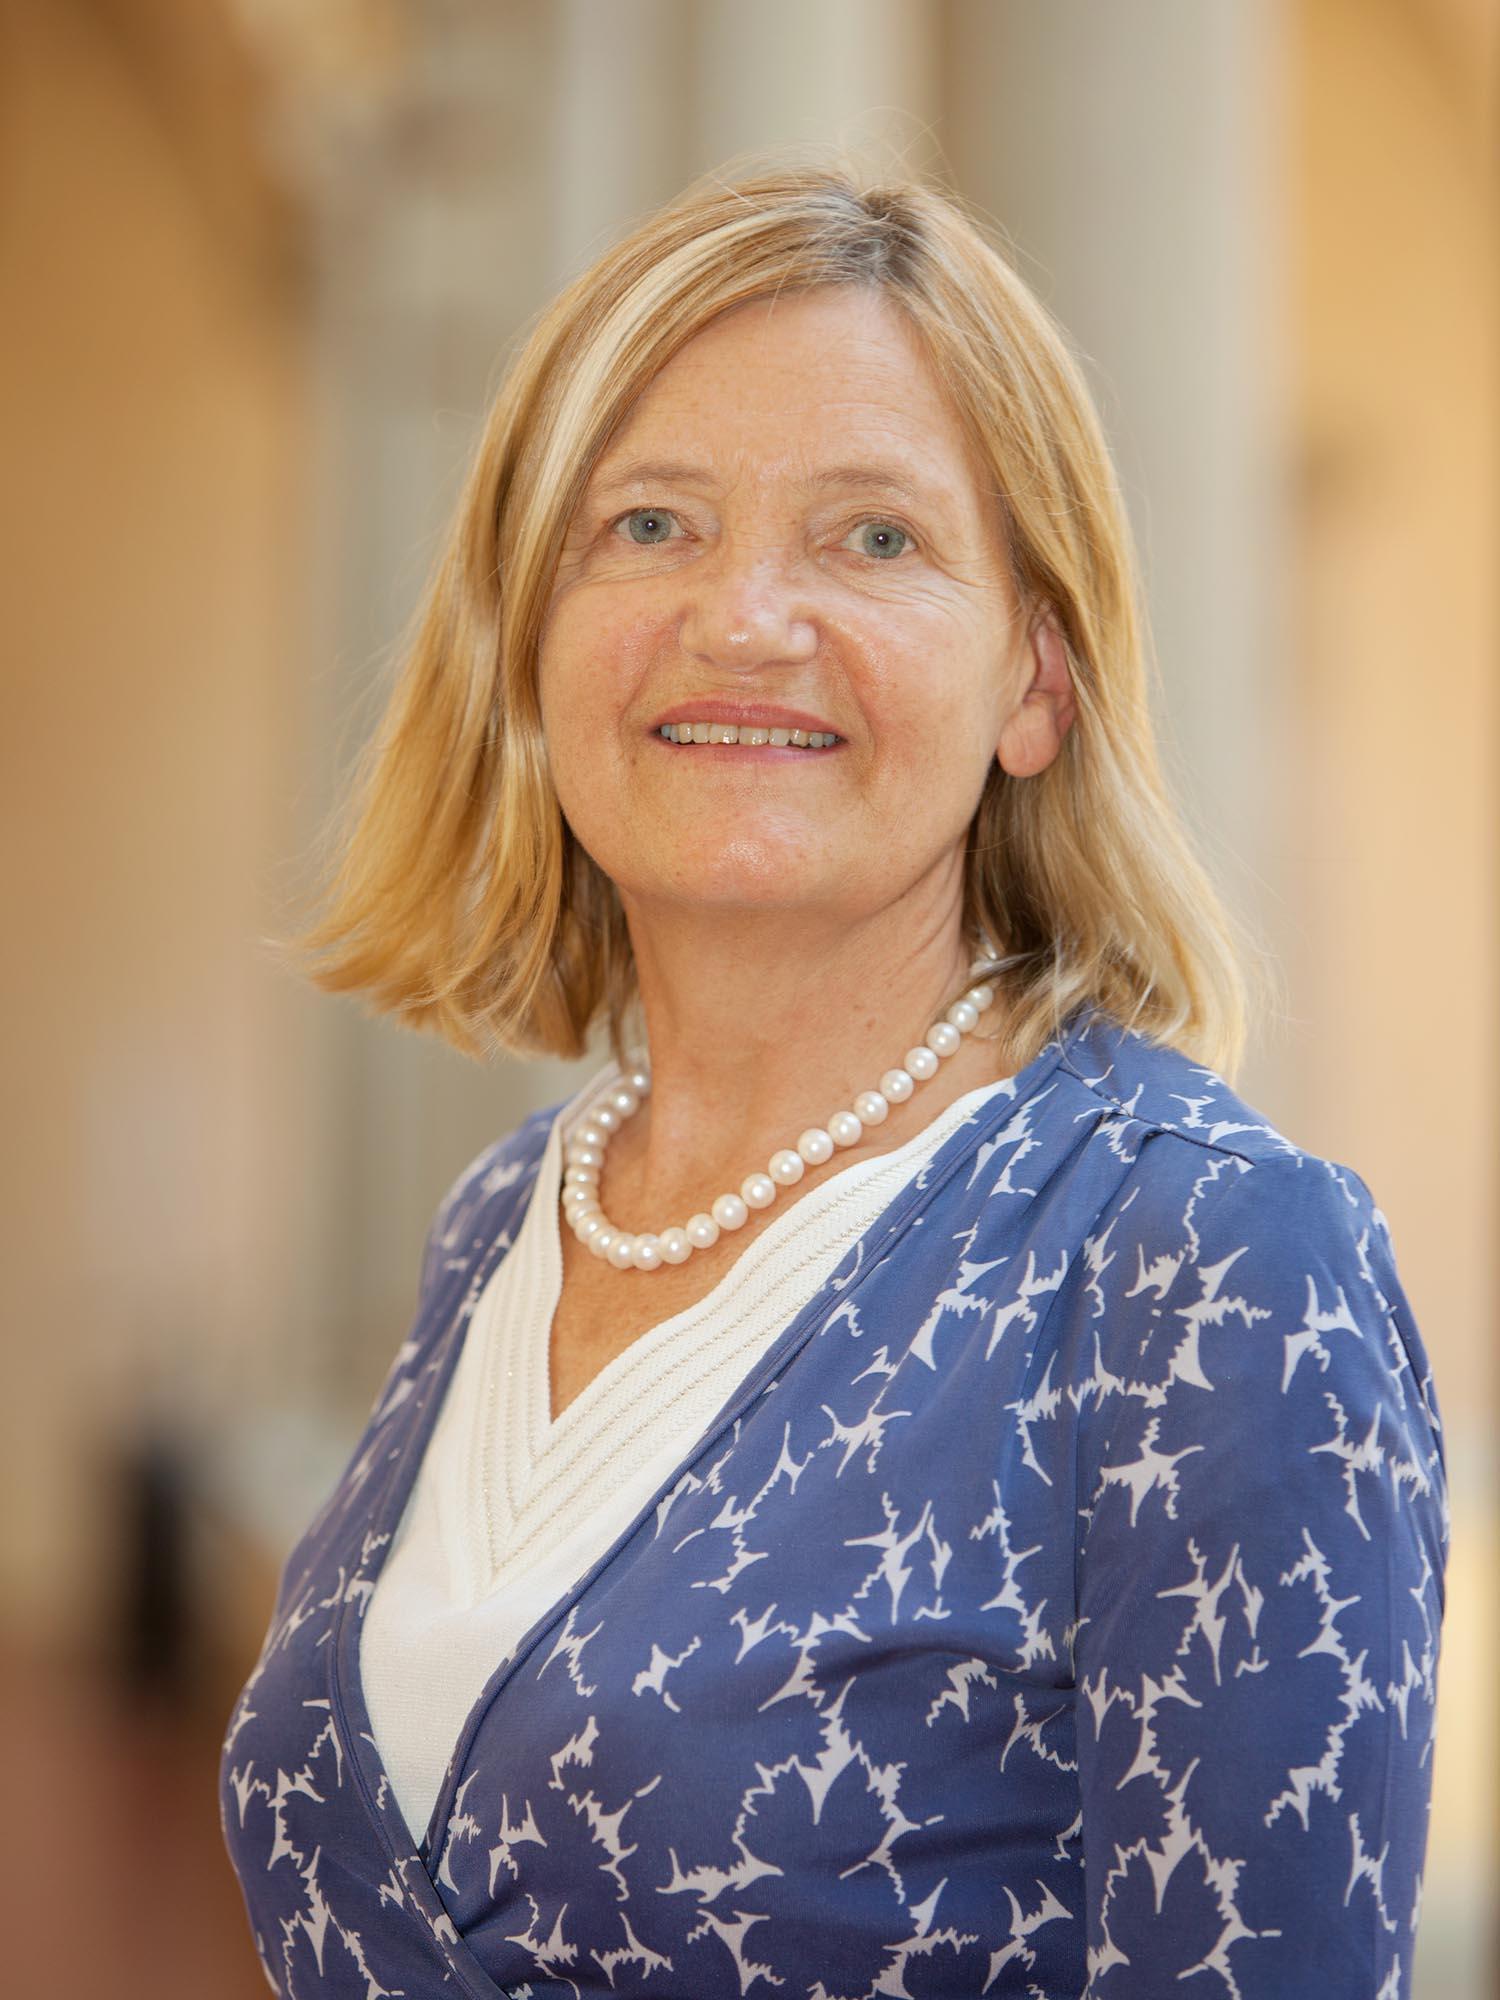 Professor Brigid Laffan